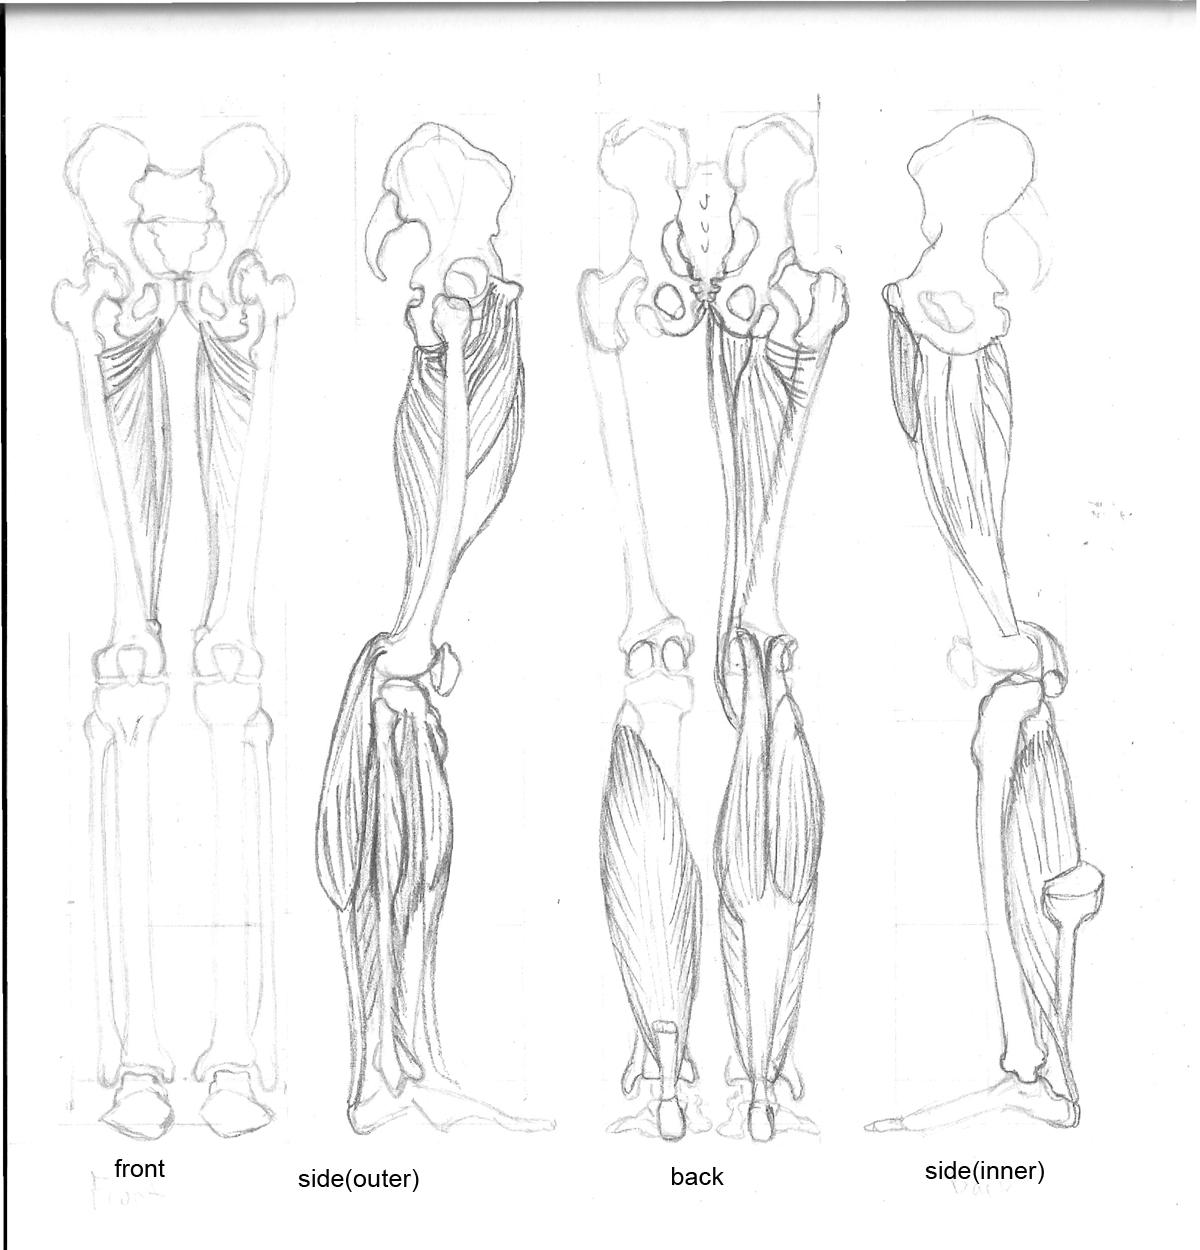 leg muscles drawing - photo #18